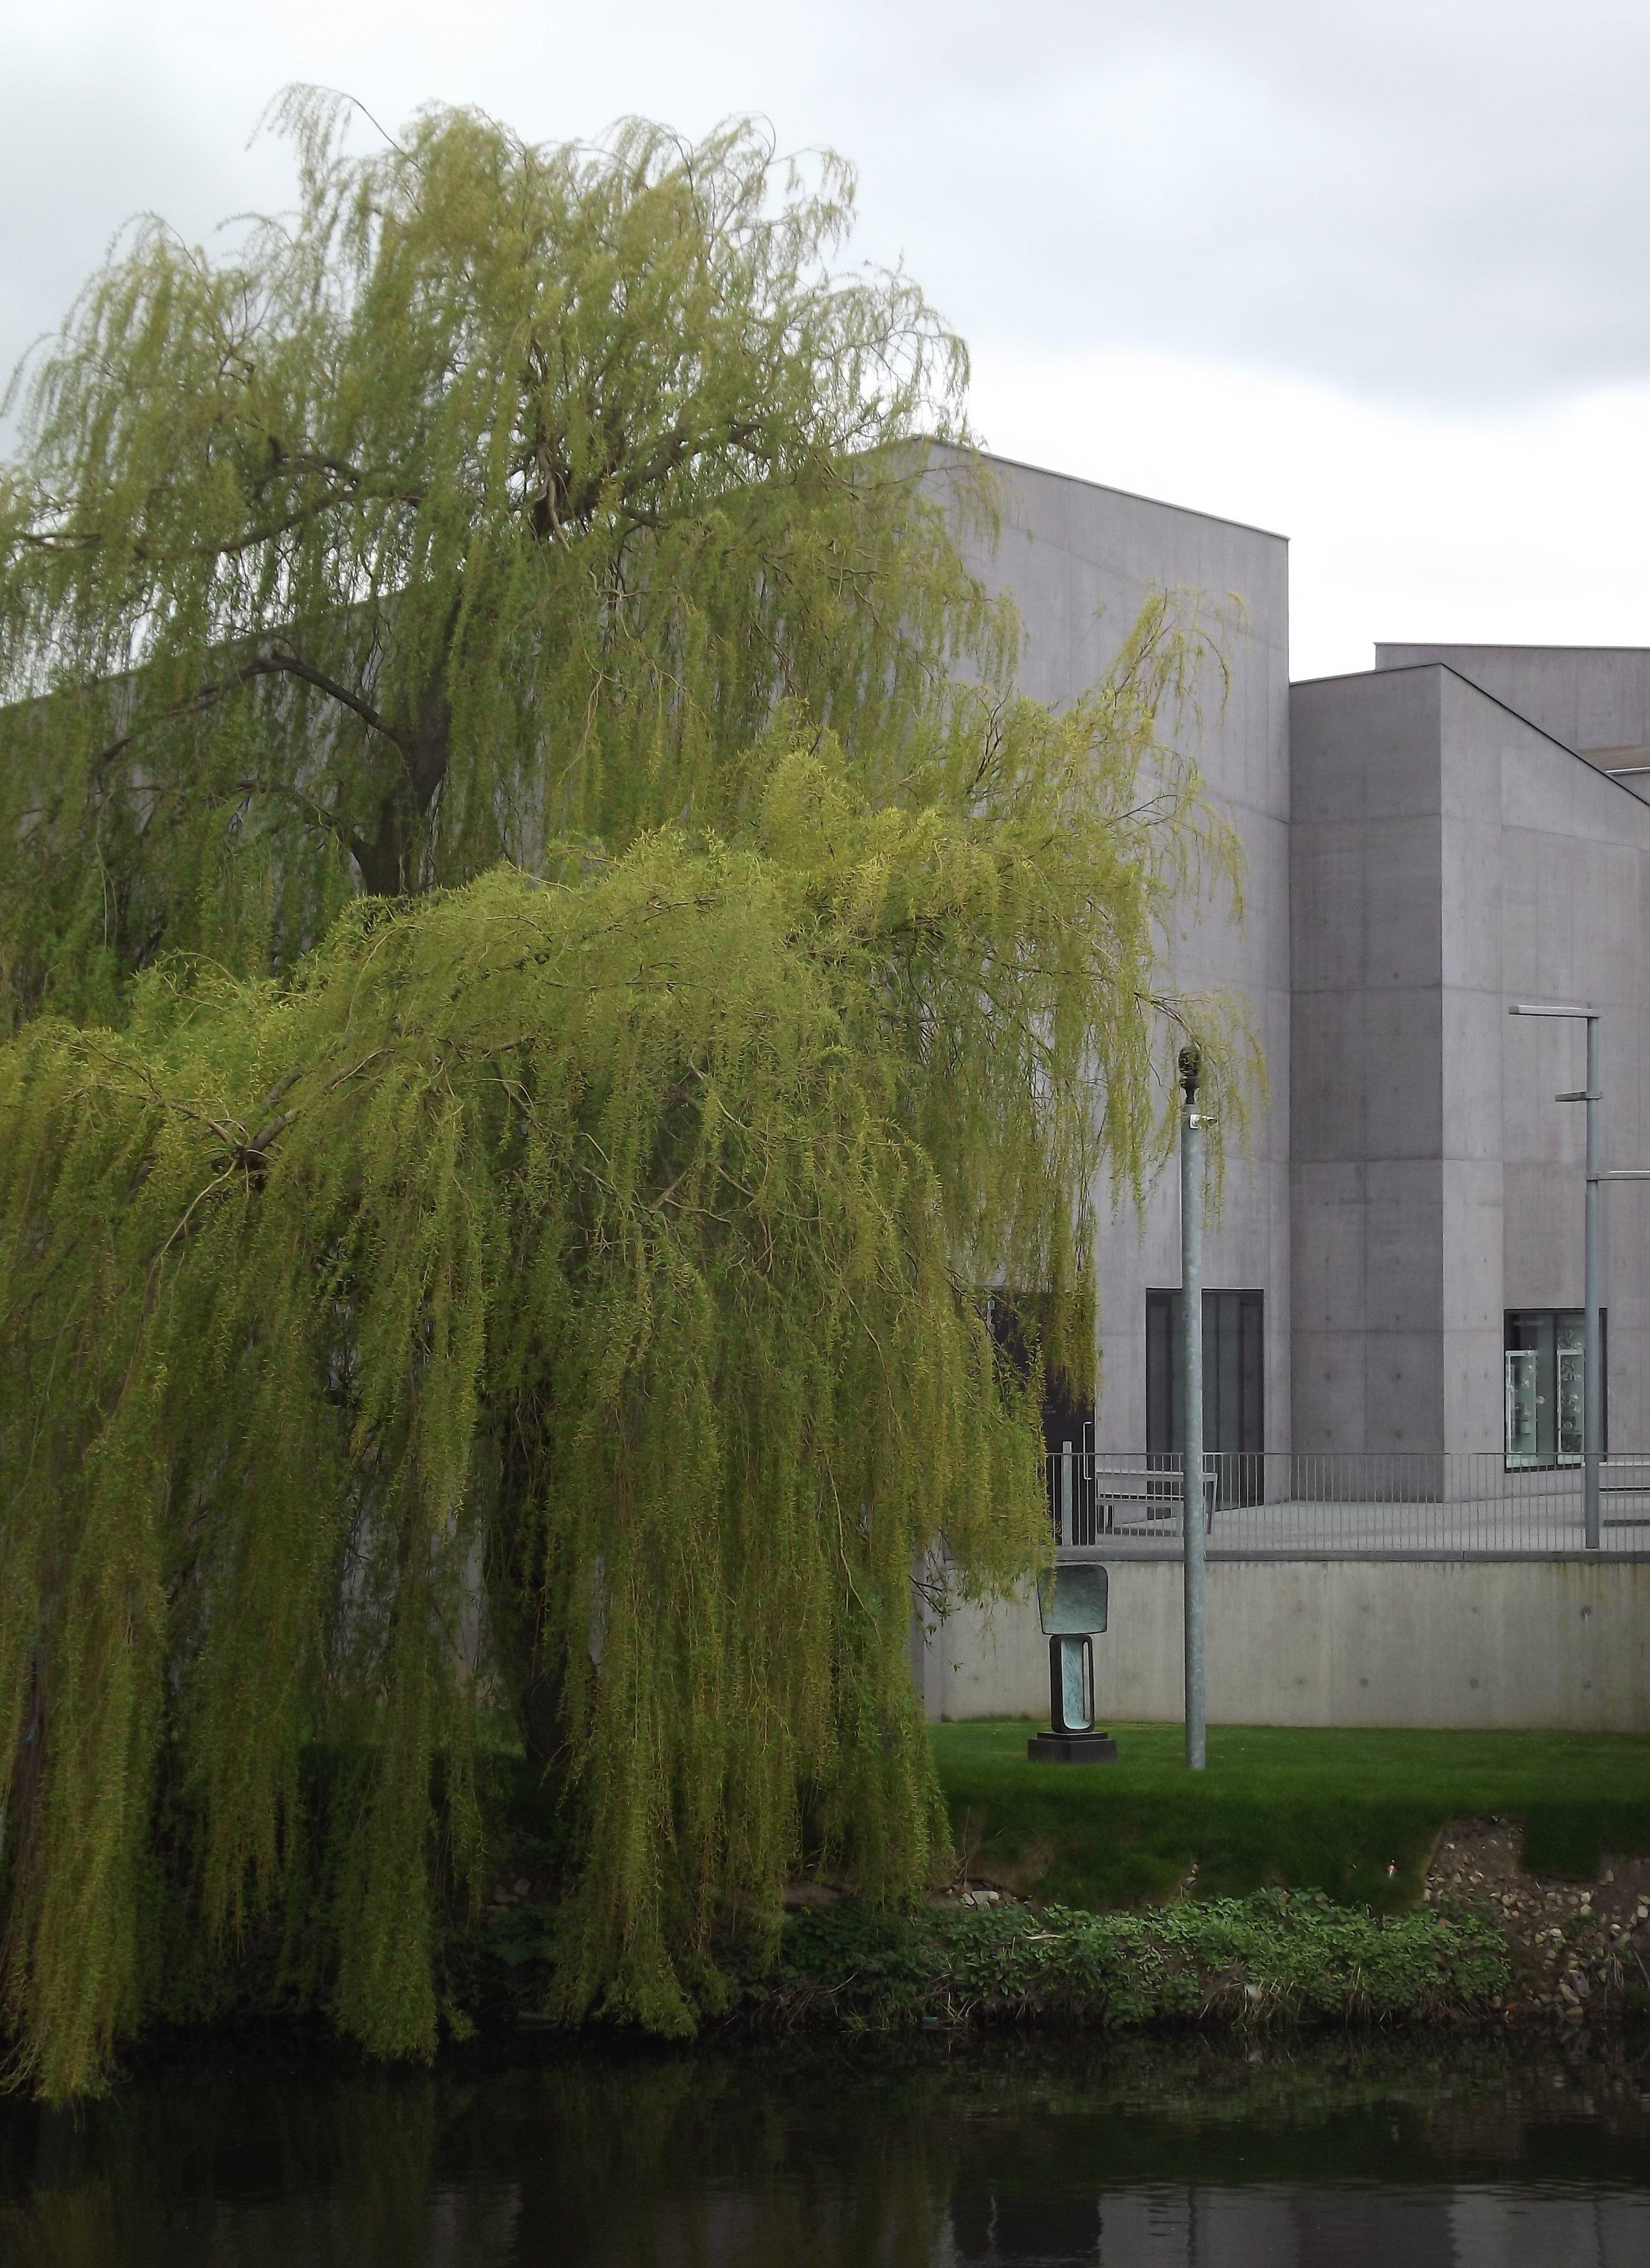 The exterior of Hepworth Wakefield gallery.